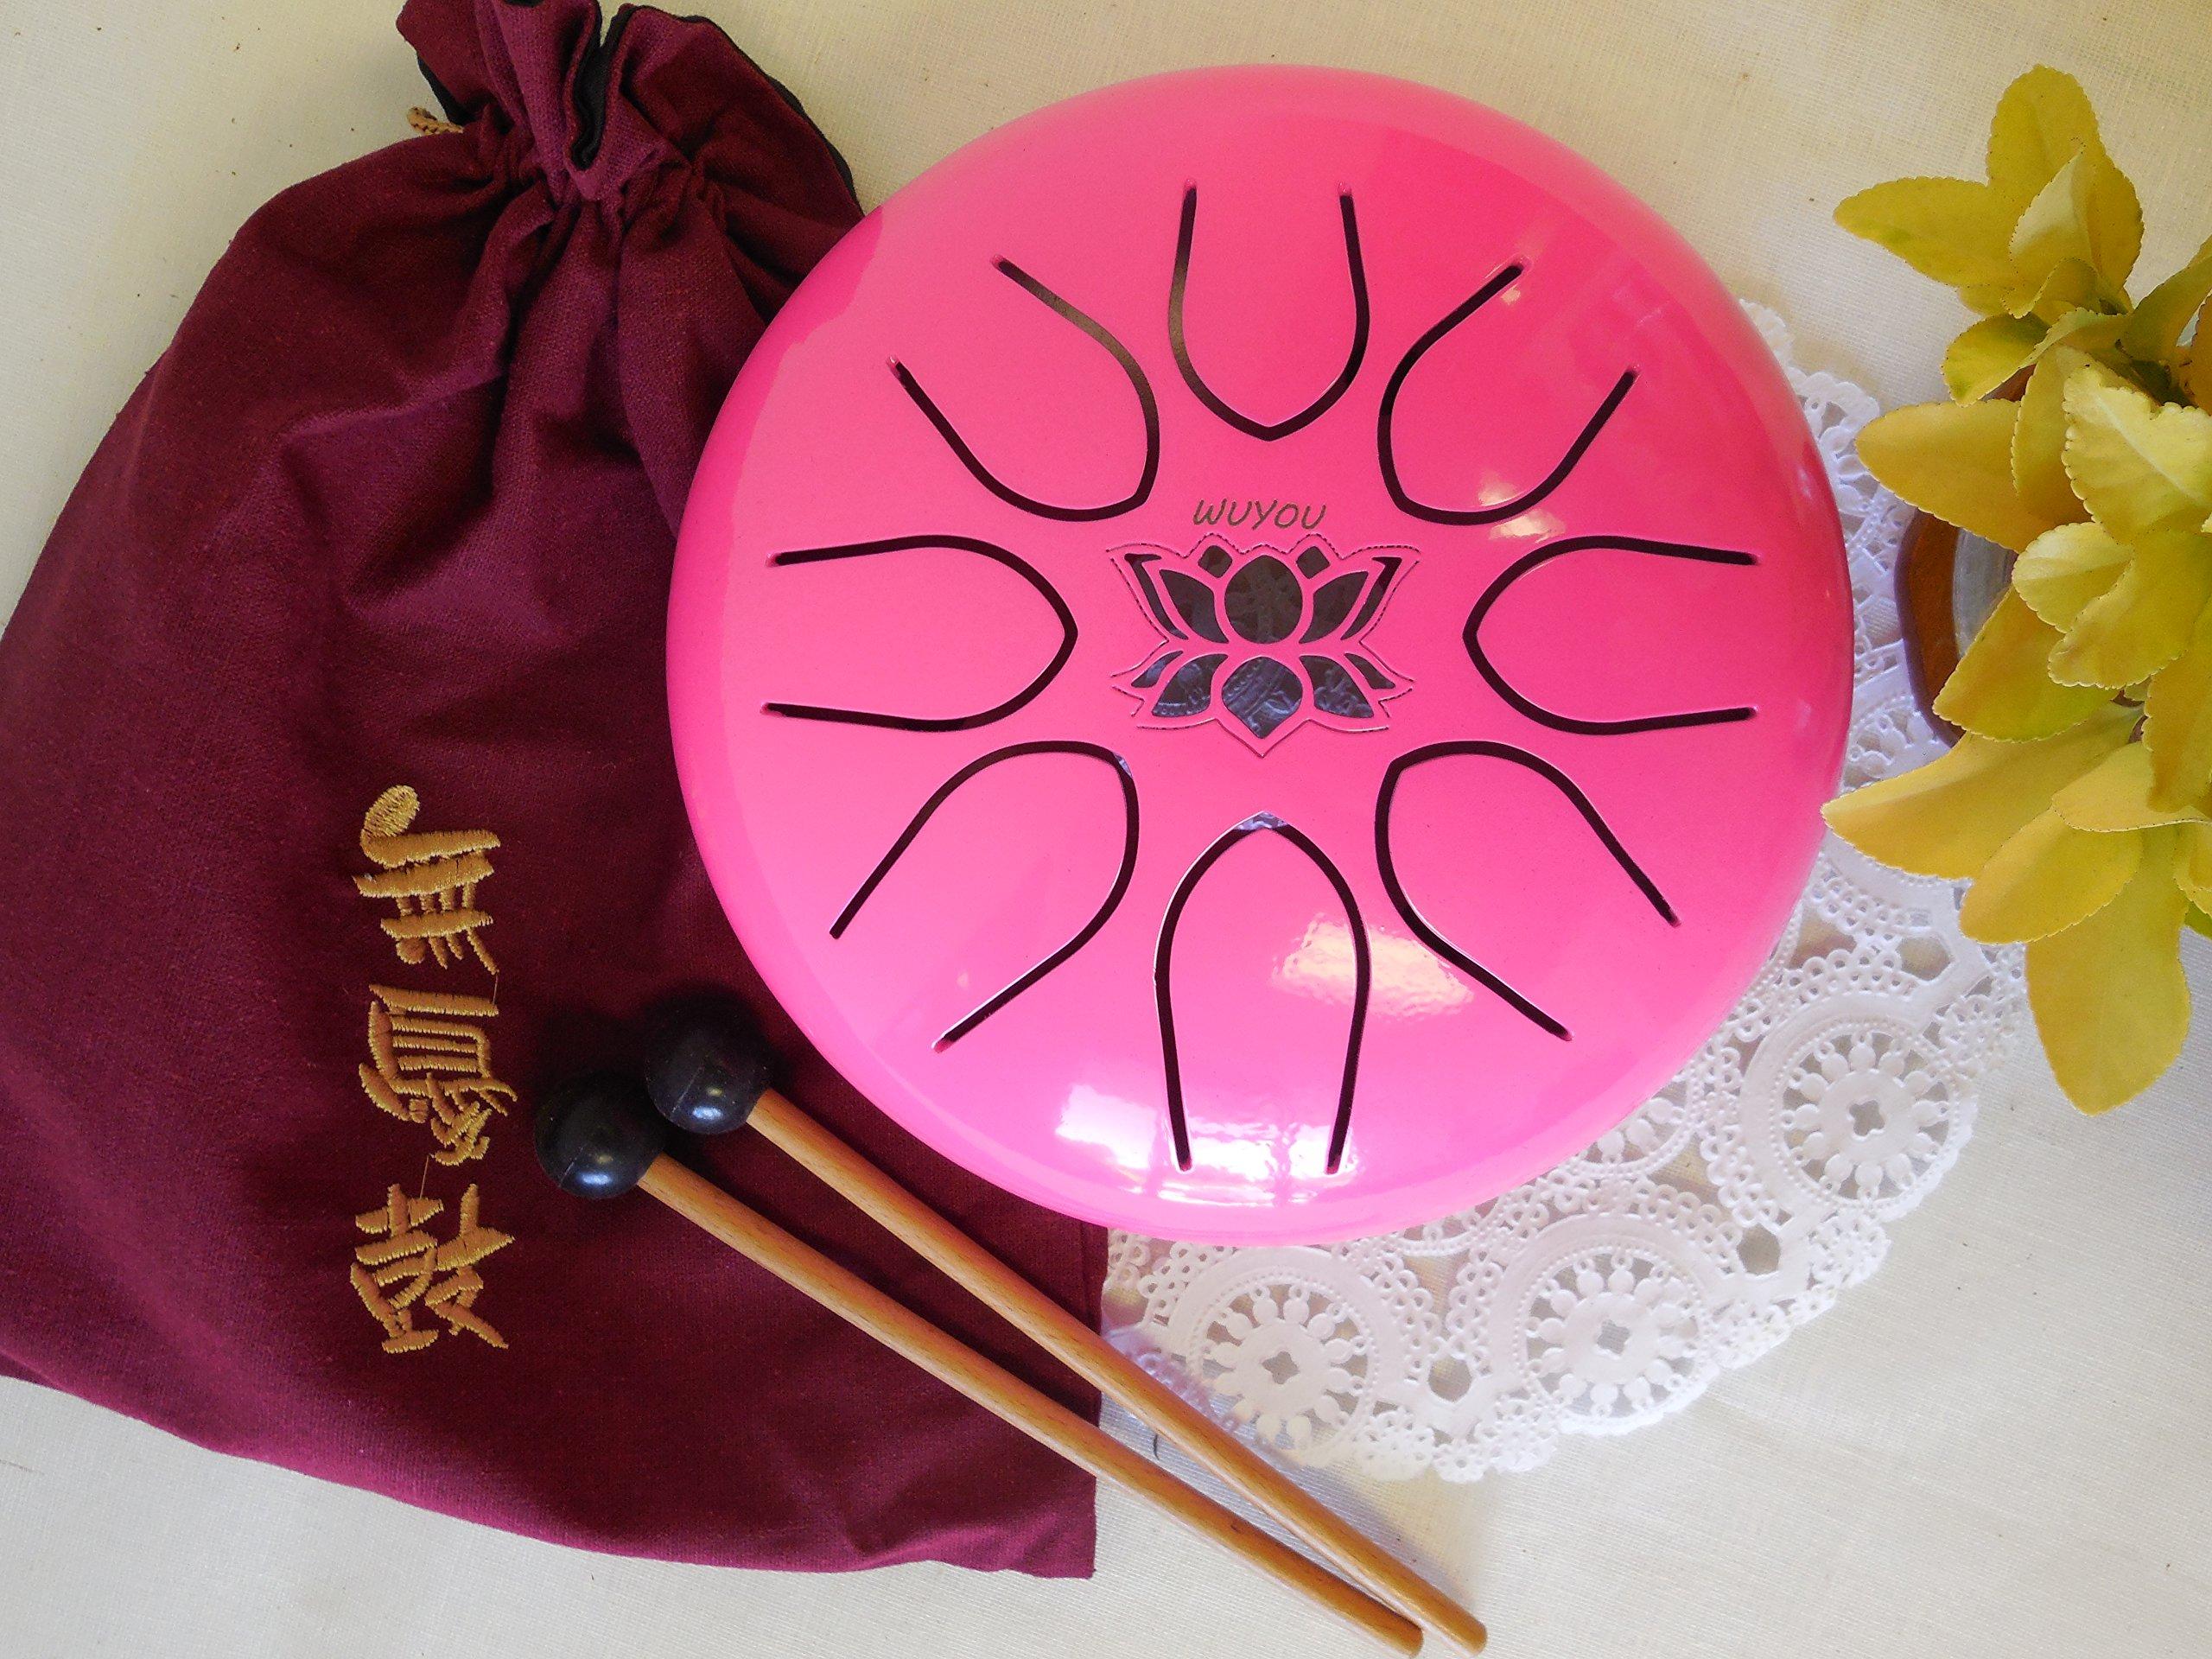 WuYou 8in UFO Pink Steel tongue drum, Lotus symble drum, Handpan, FREE Mallets and Bag